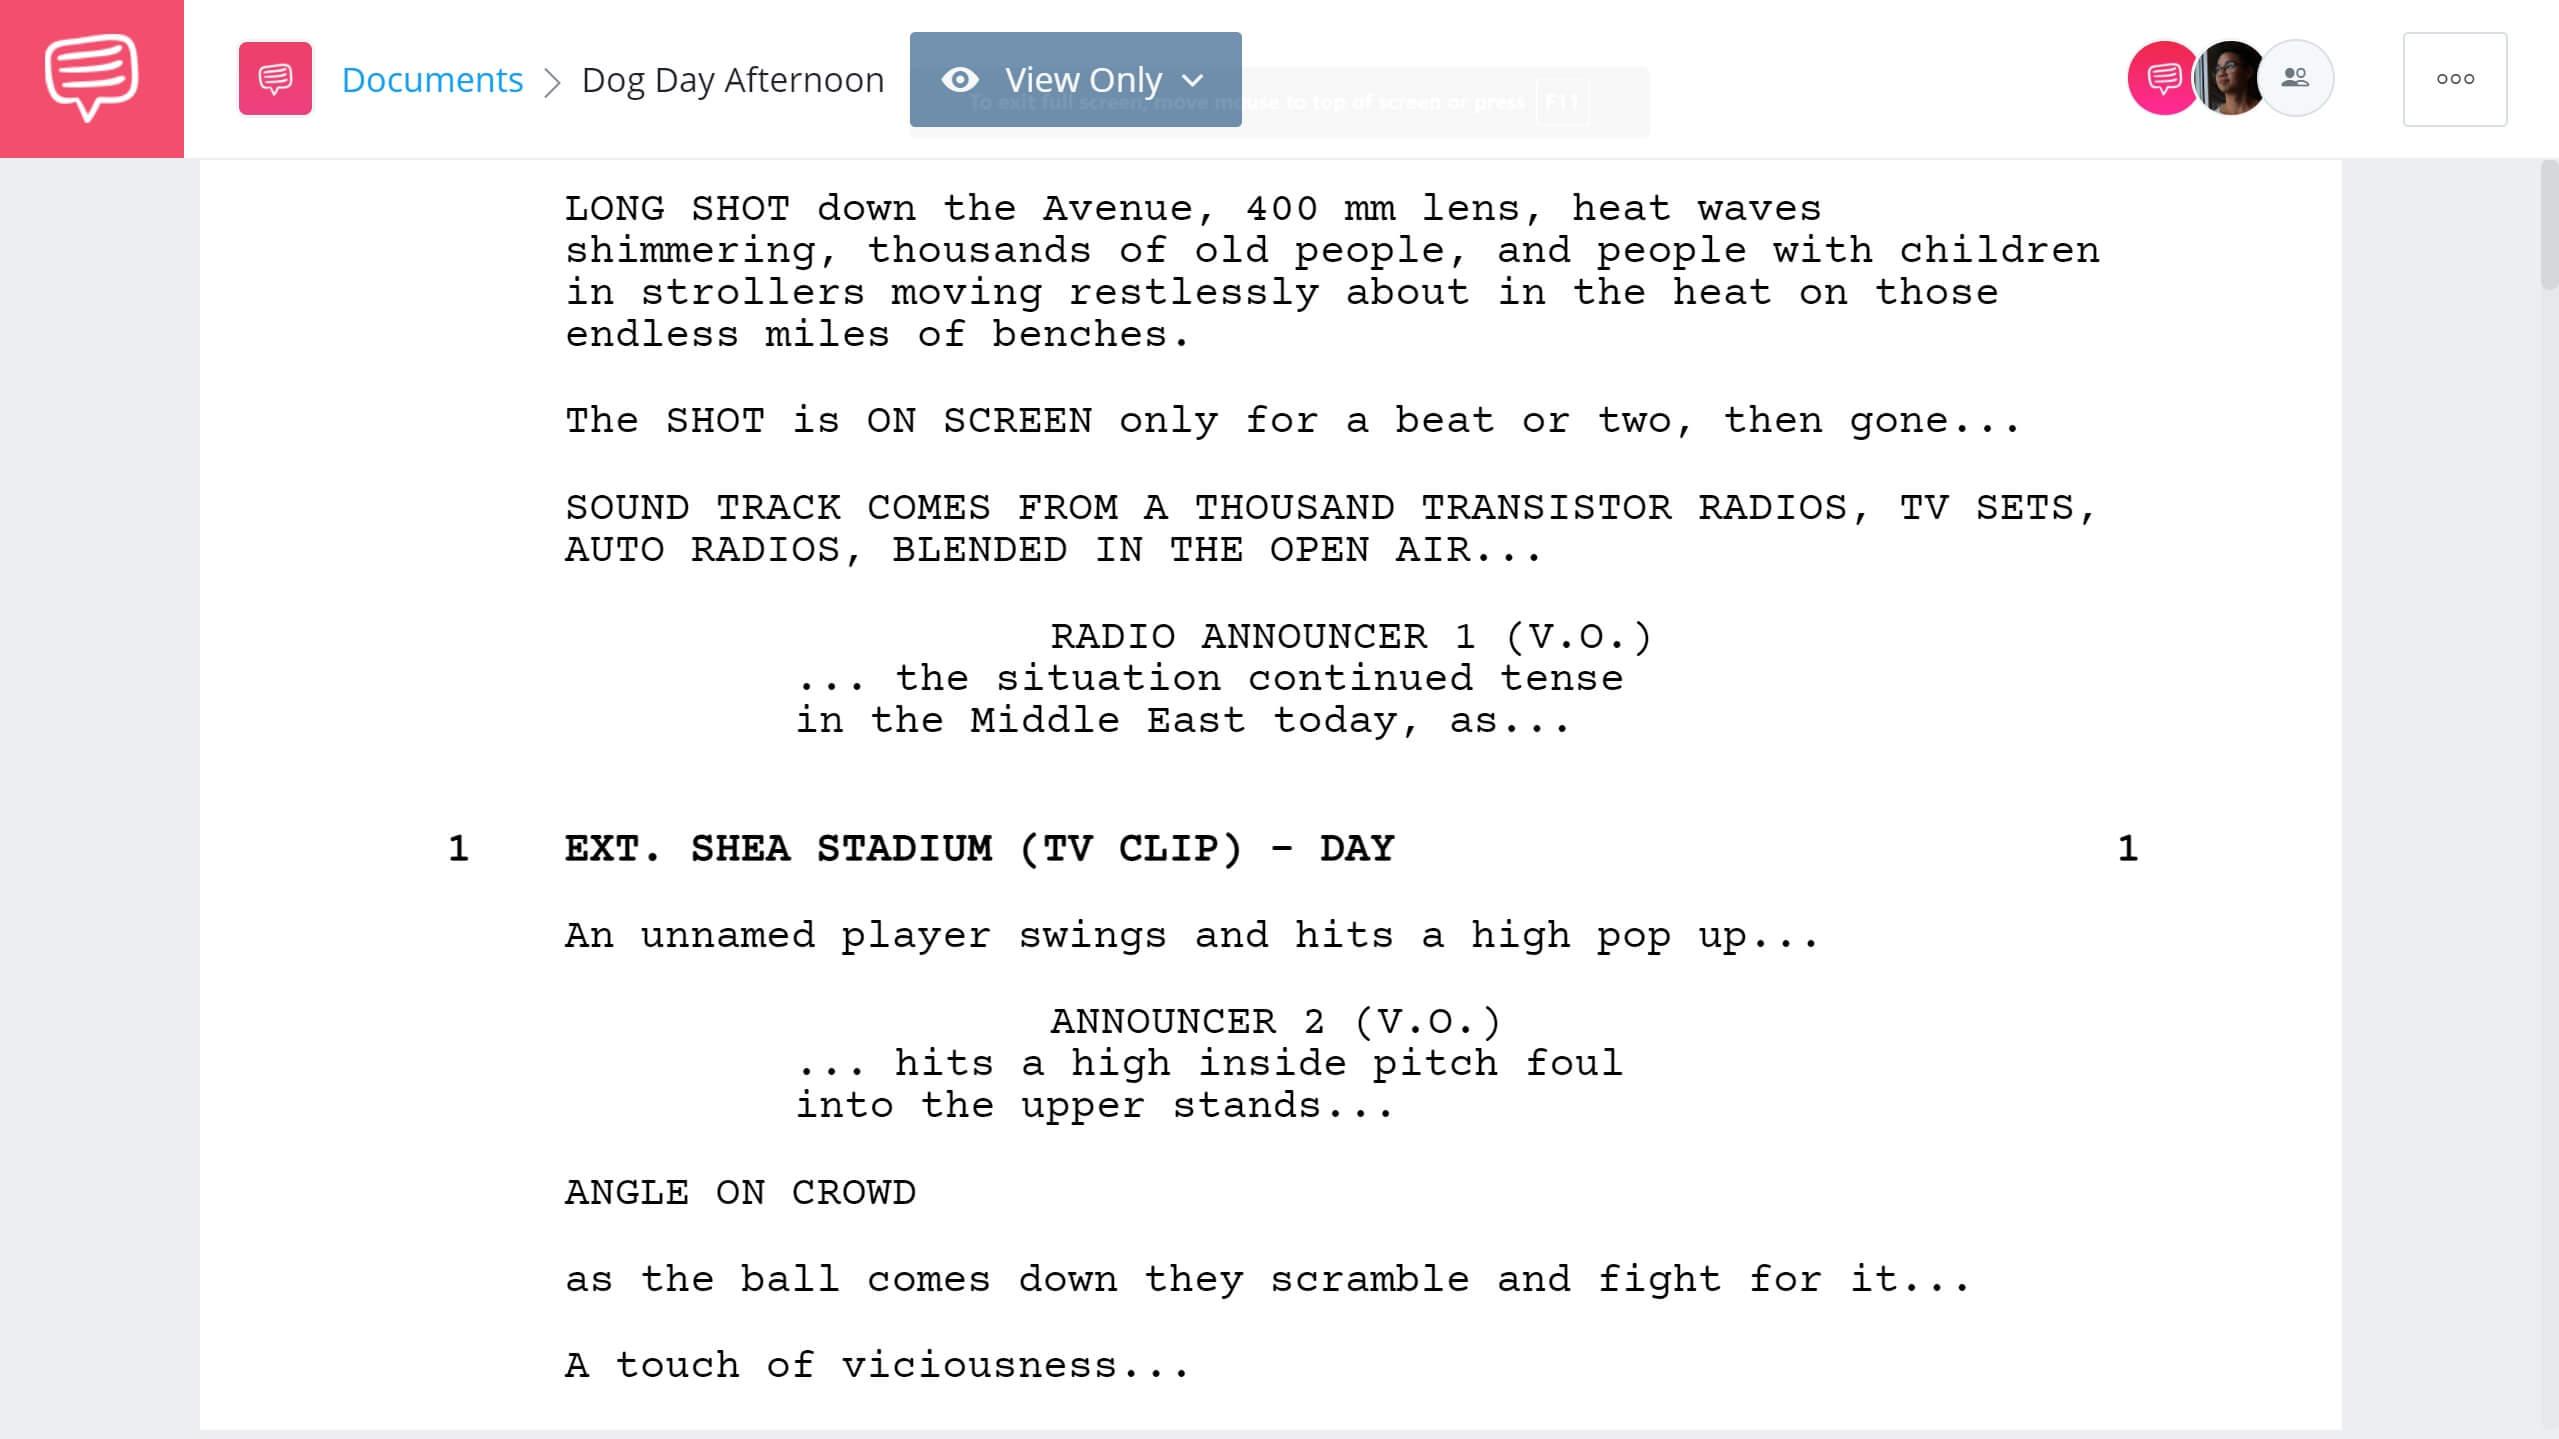 Best Original Screenplay Academy Award - Dog Day Afternoon Full Script PDF Download - StudioBinder Screenwriting Software